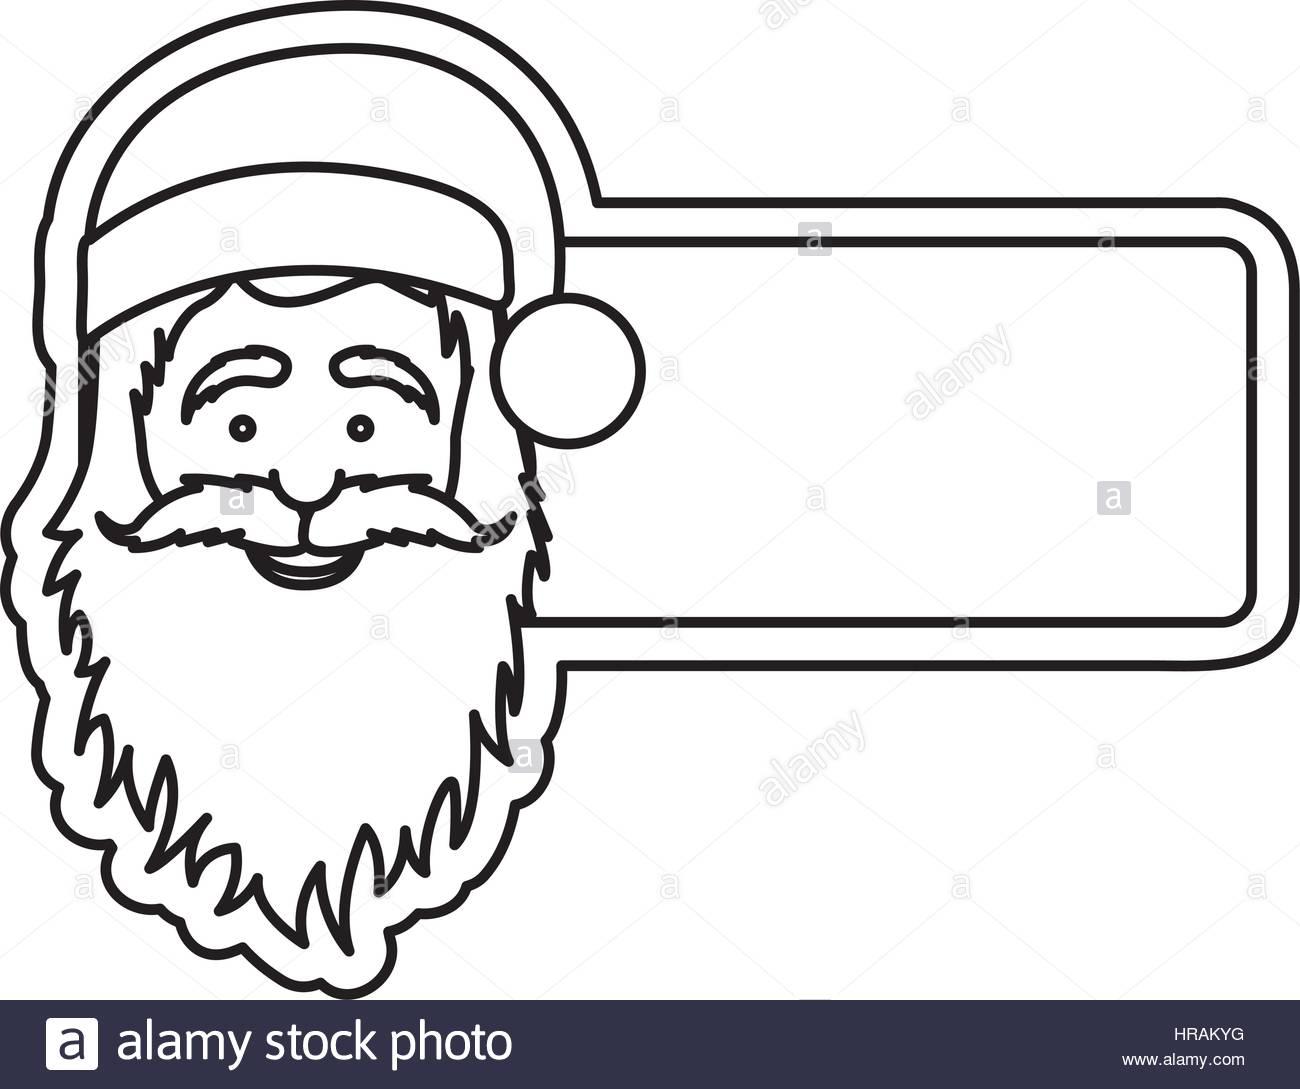 1300x1089 Silhouette Banner With Face Cartoon Santa Claus Stock Vector Art